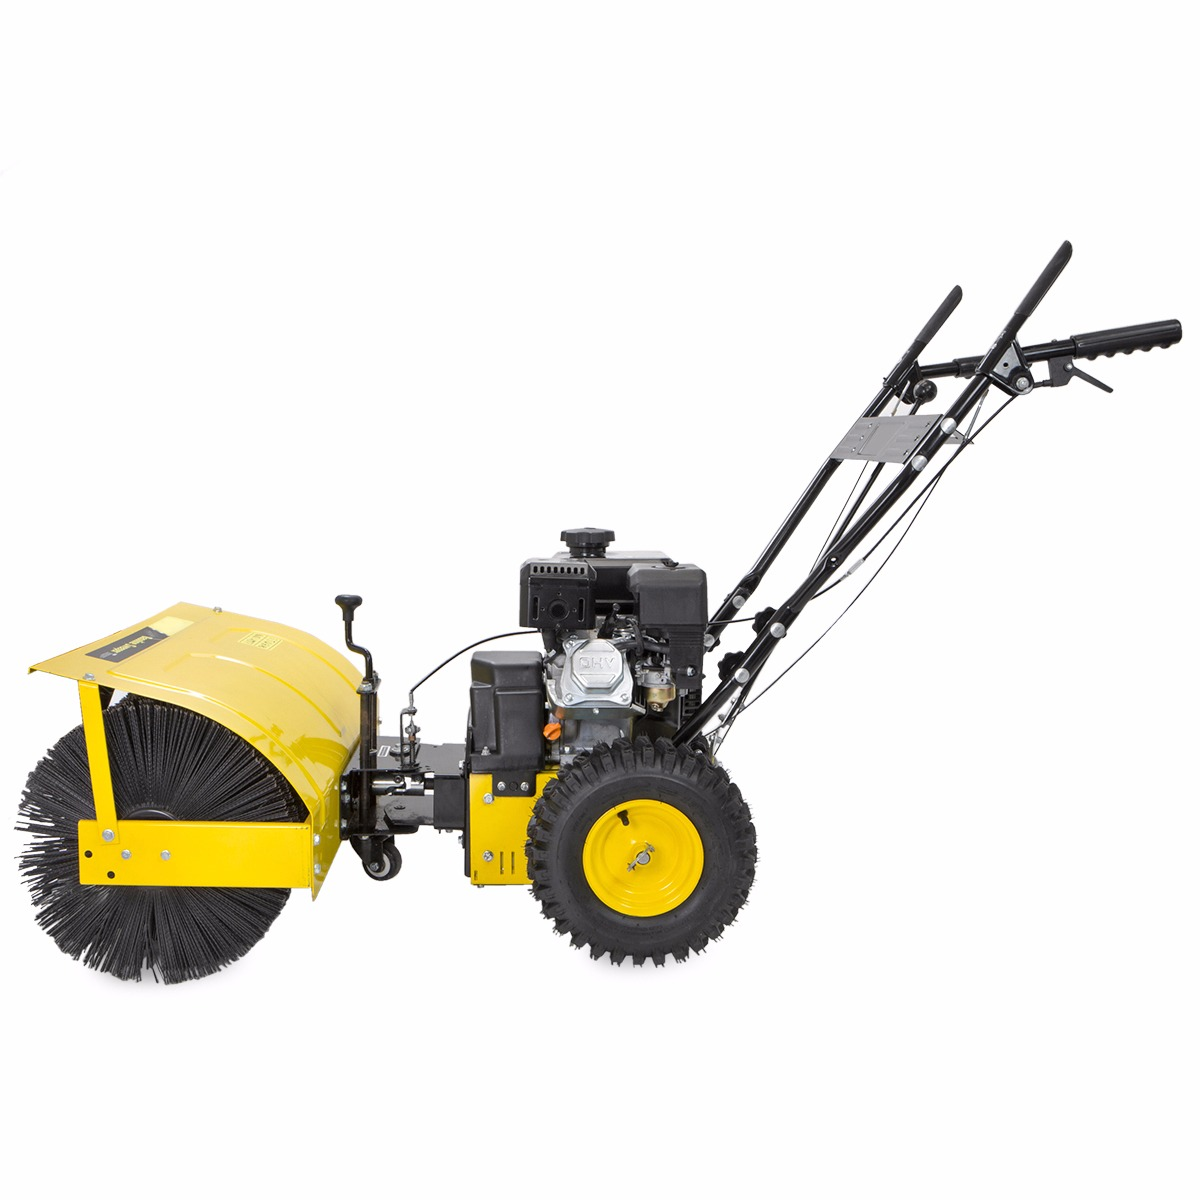 Rotary Broom Sweeper : Quot walk behind snow sweeper power brush broom industrial